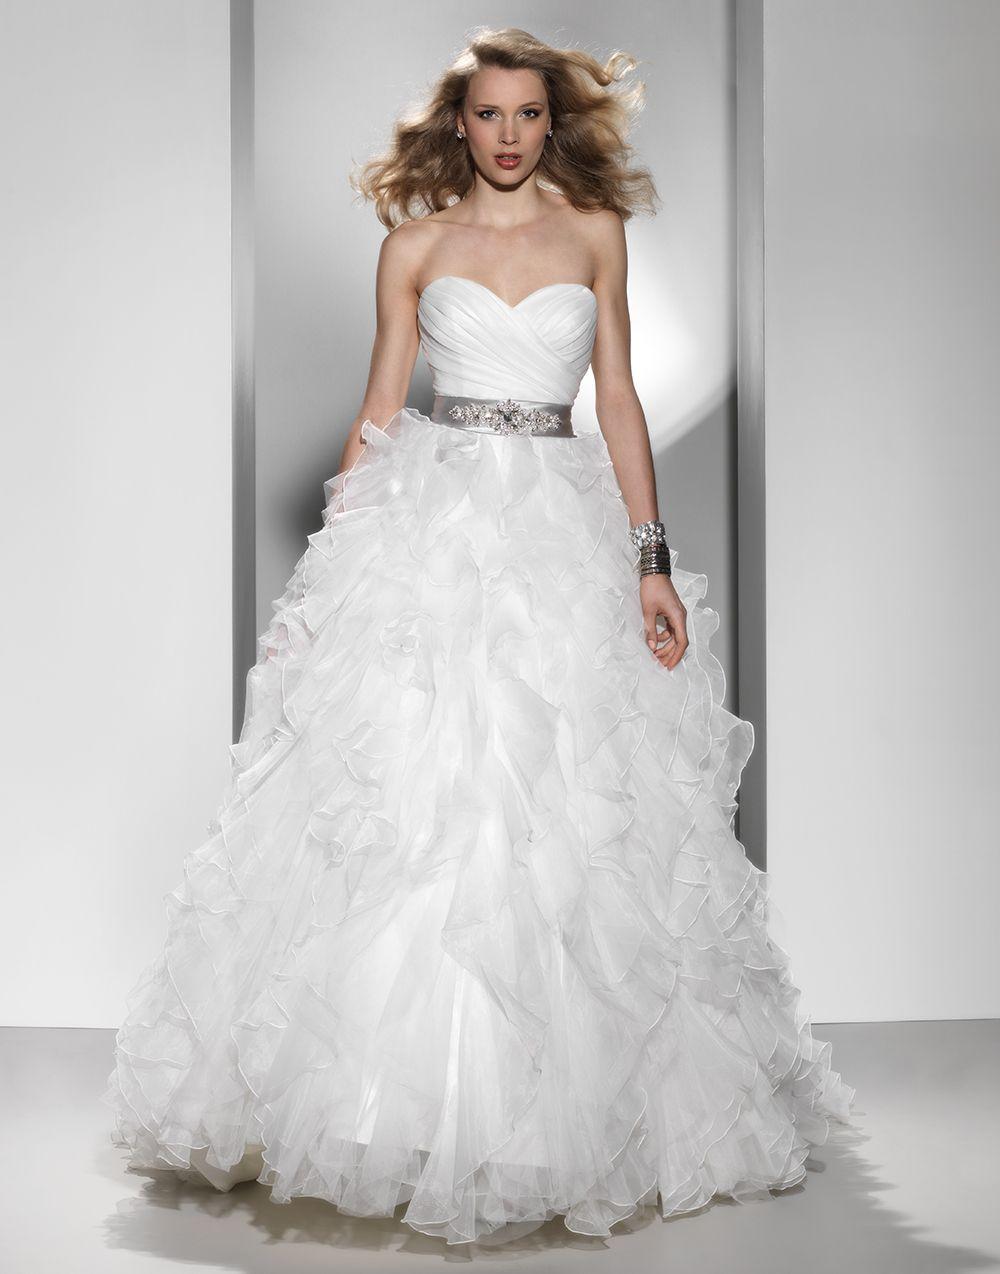 Justin alexander signature wedding dresses style strapless